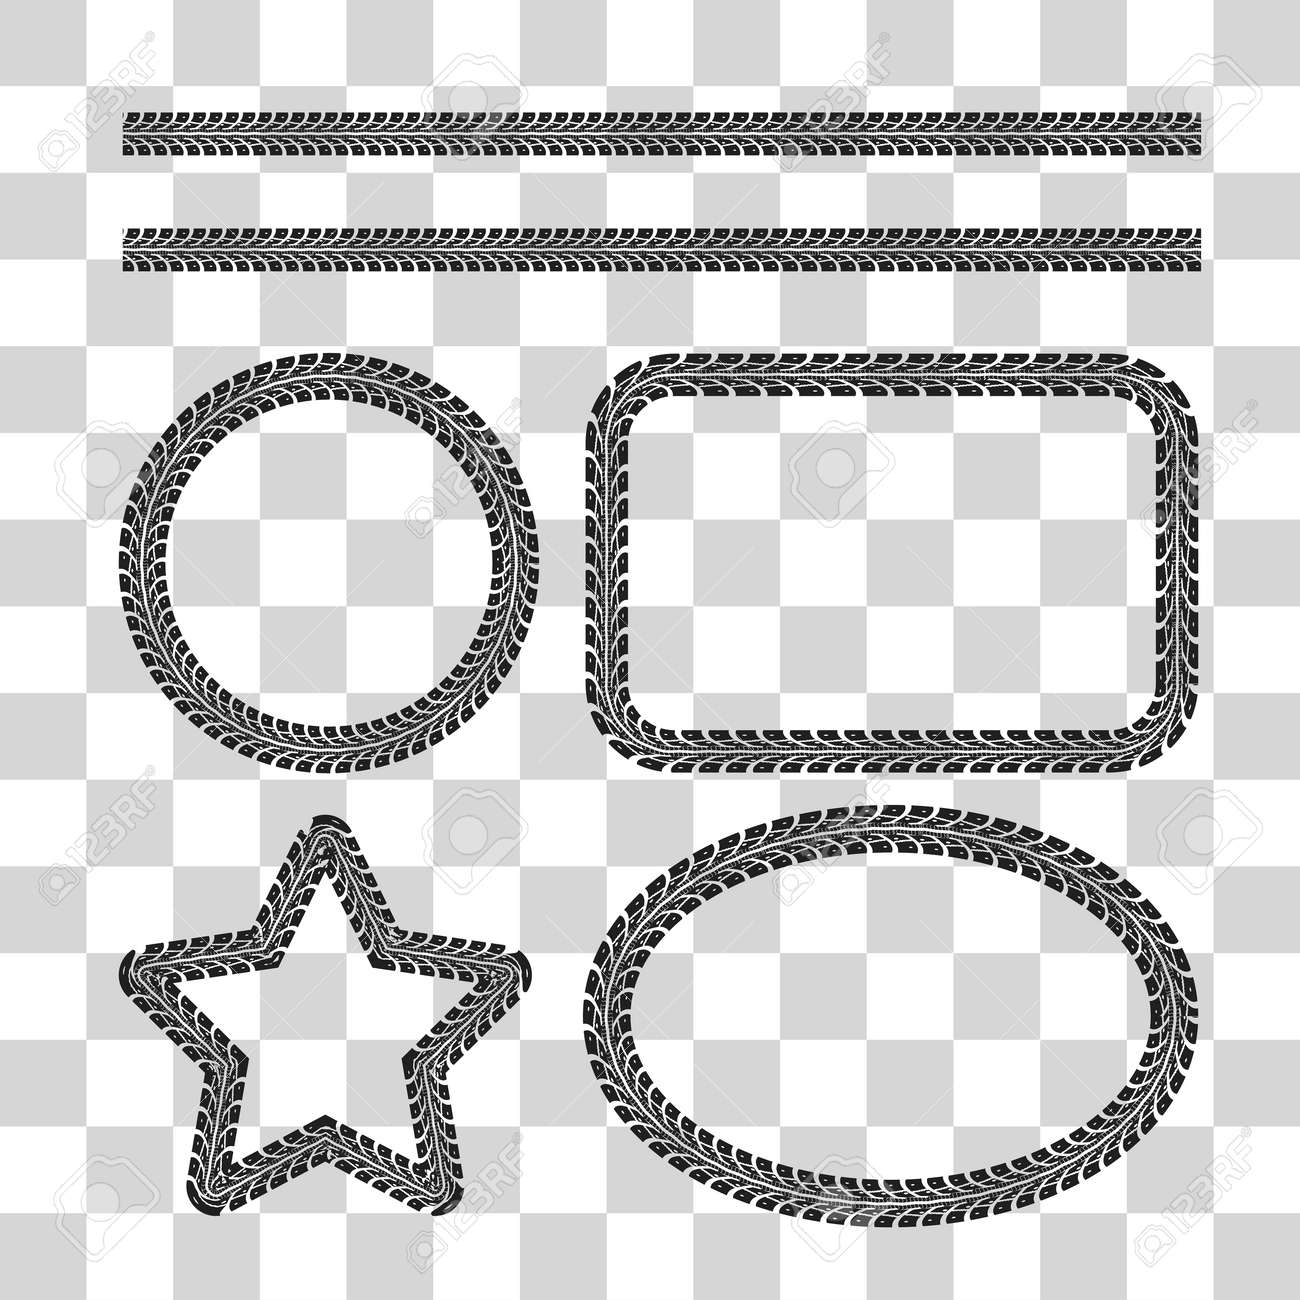 tire tracks frame set vector illustration on checkered background rh 123rf com Tire Track Border Clip Art Mud Tire Tracks Clip Art